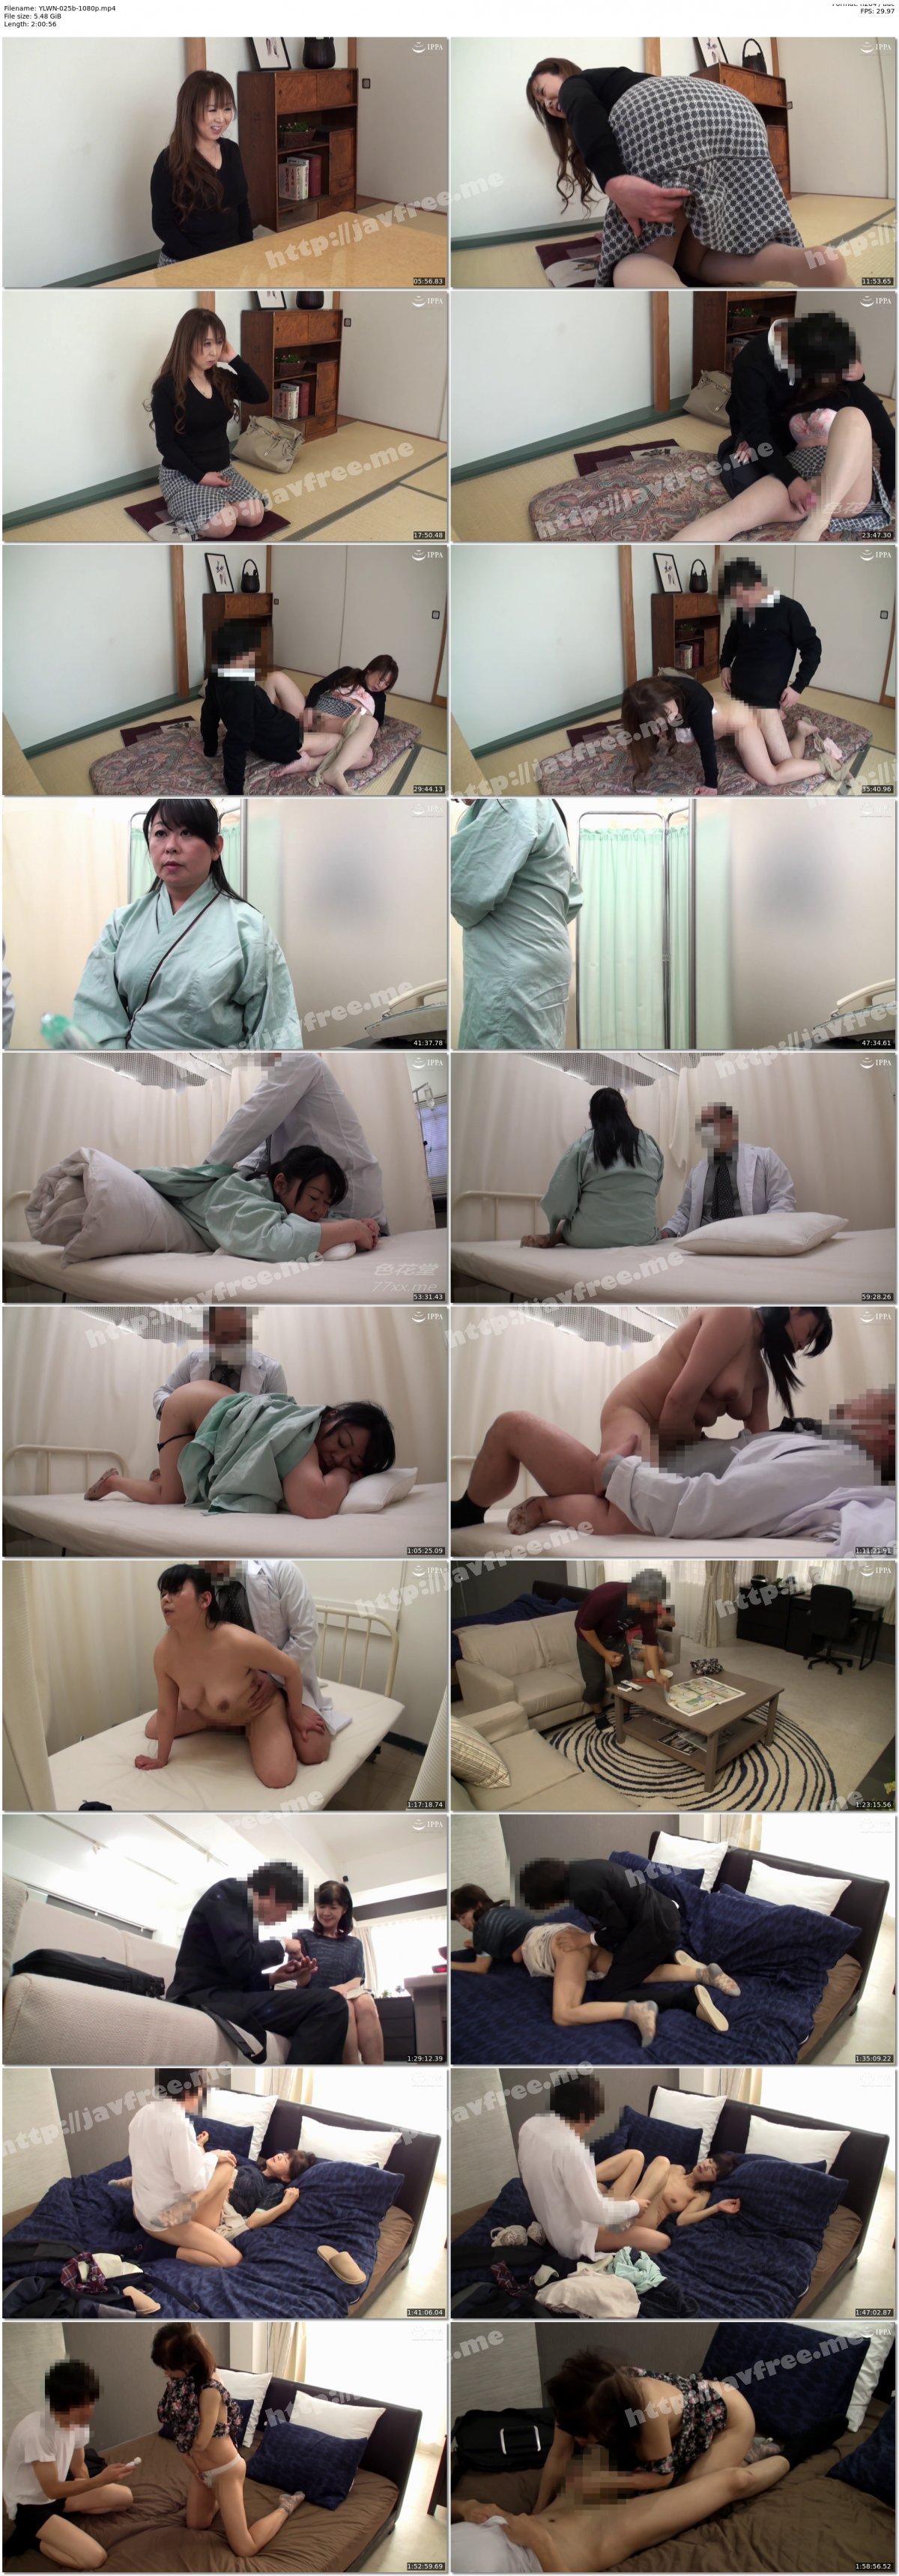 [HD][YLWN-025] 投稿!自分の妻をだまして他人に寝取らせる猥褻映像4時間 - image YLWN-025b-1080p on https://javfree.me